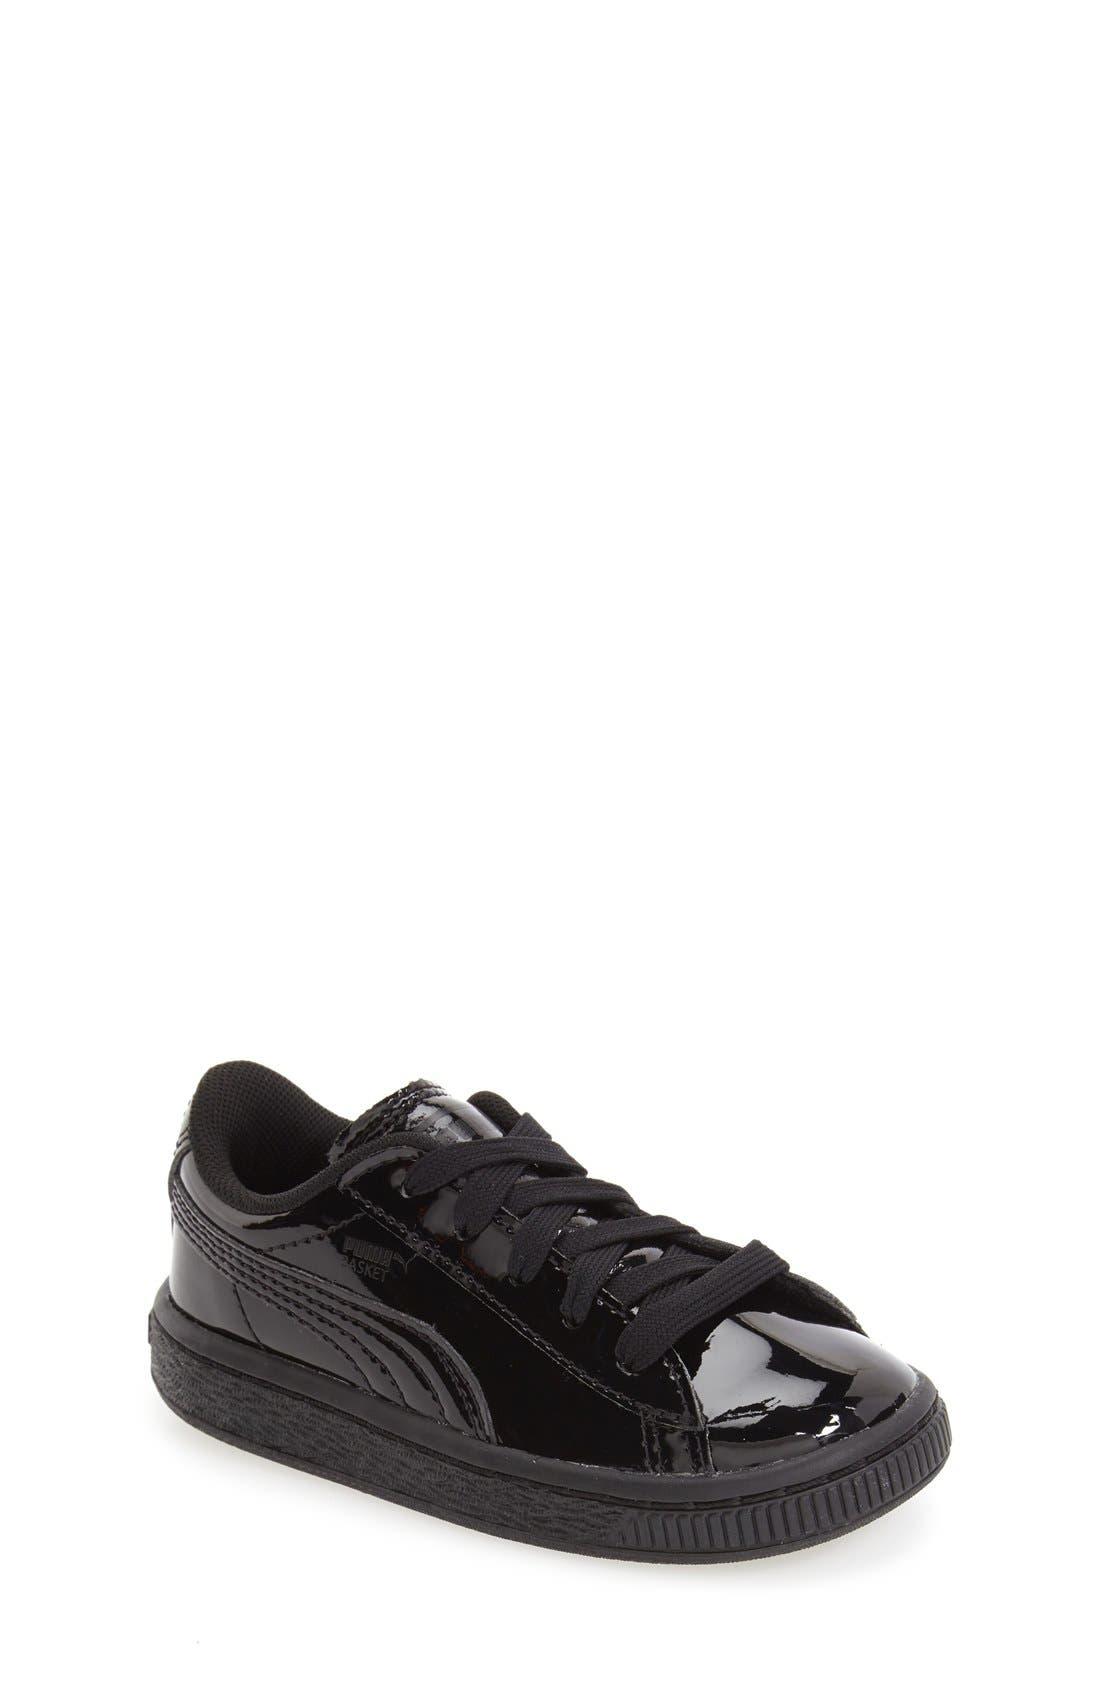 'Basket Classic' Shoe,                             Main thumbnail 1, color,                             001